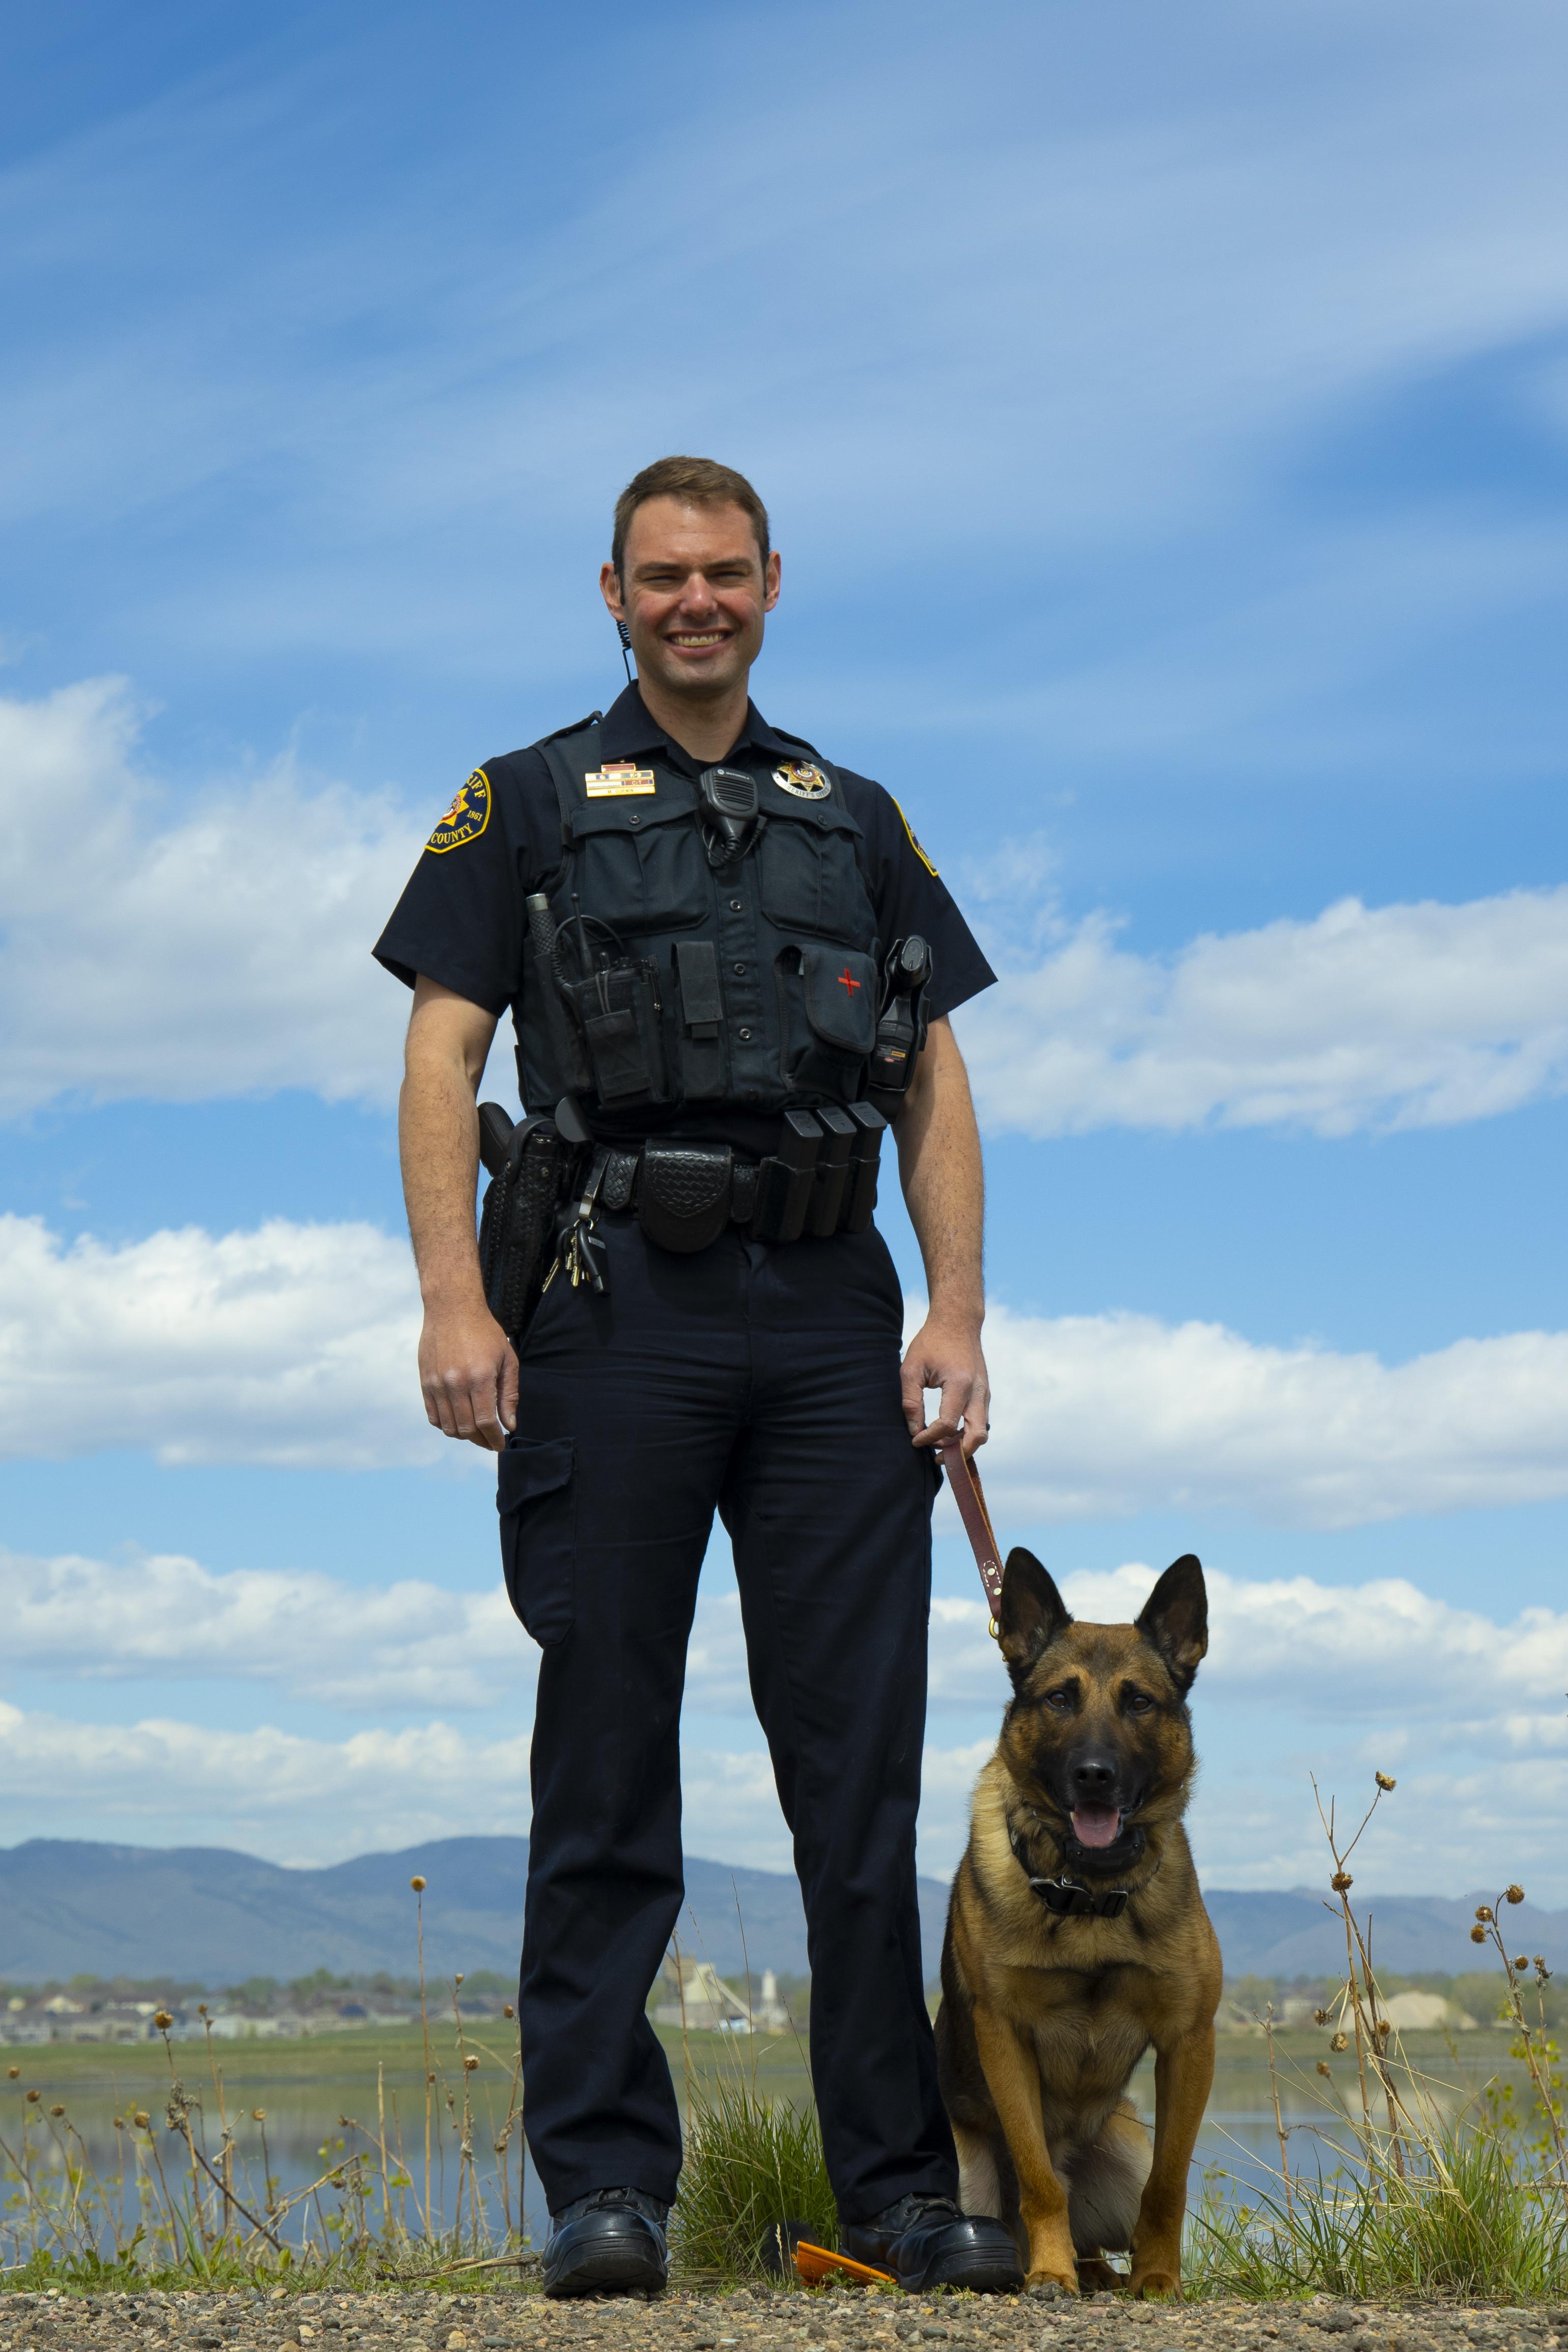 Image 3: Deputy Mike Gurwin and K9 Taz (Belgian Malinois)